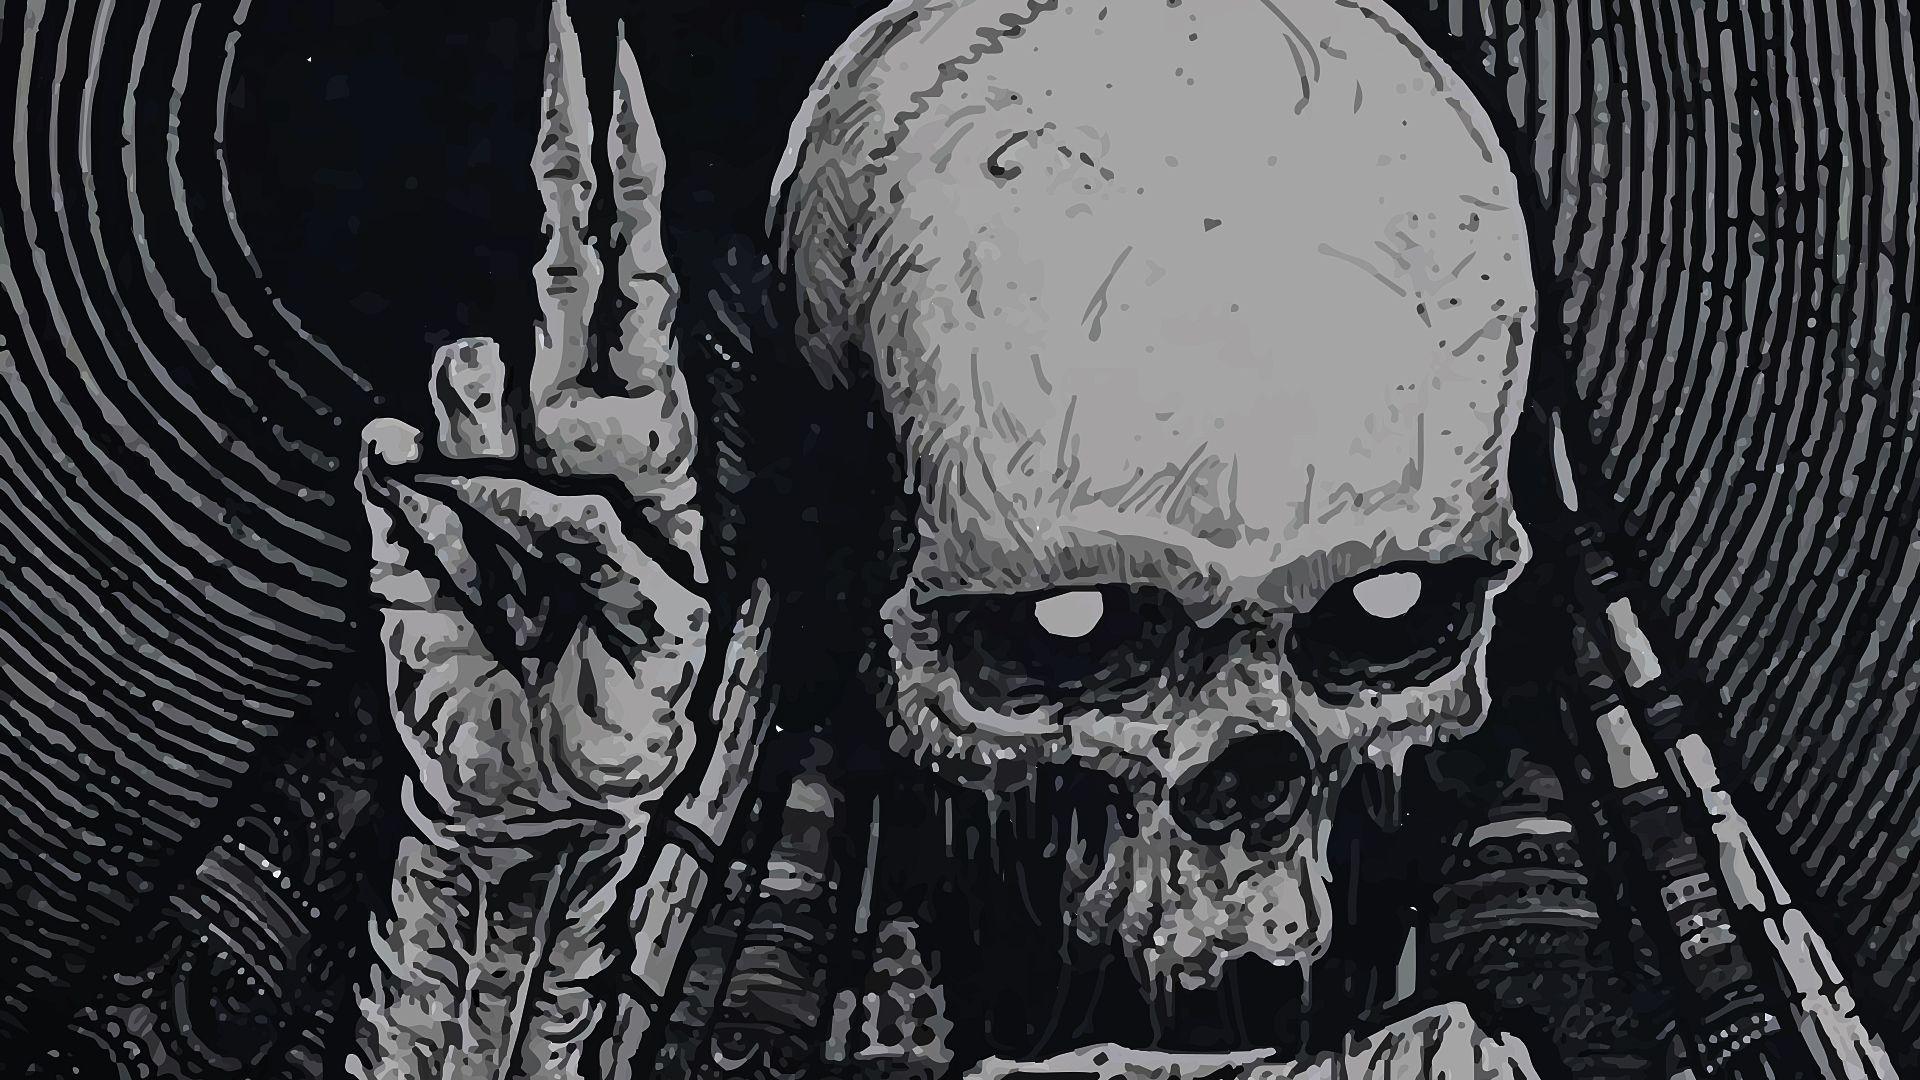 Black Metal Wallpapers HD - Wallpaper Cave